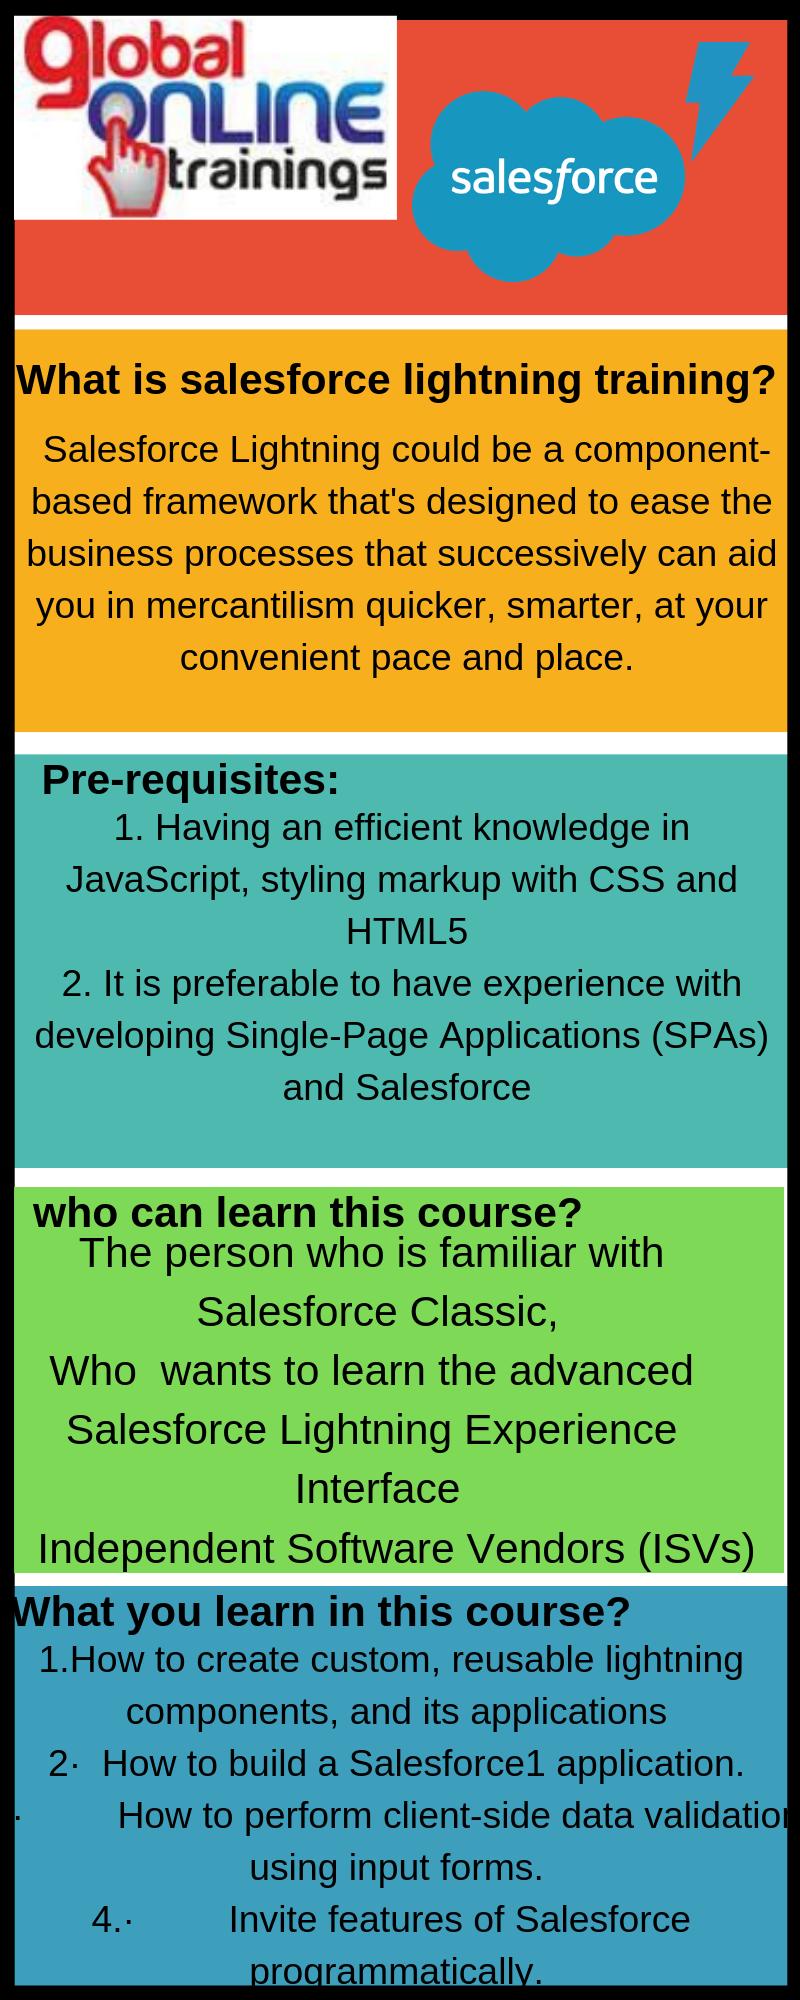 Salesforce Lightning Training Is A Framework We Offer Salesforce Lightning Developer Training Lightning Corporat Salesforce Corporate Training Online Training